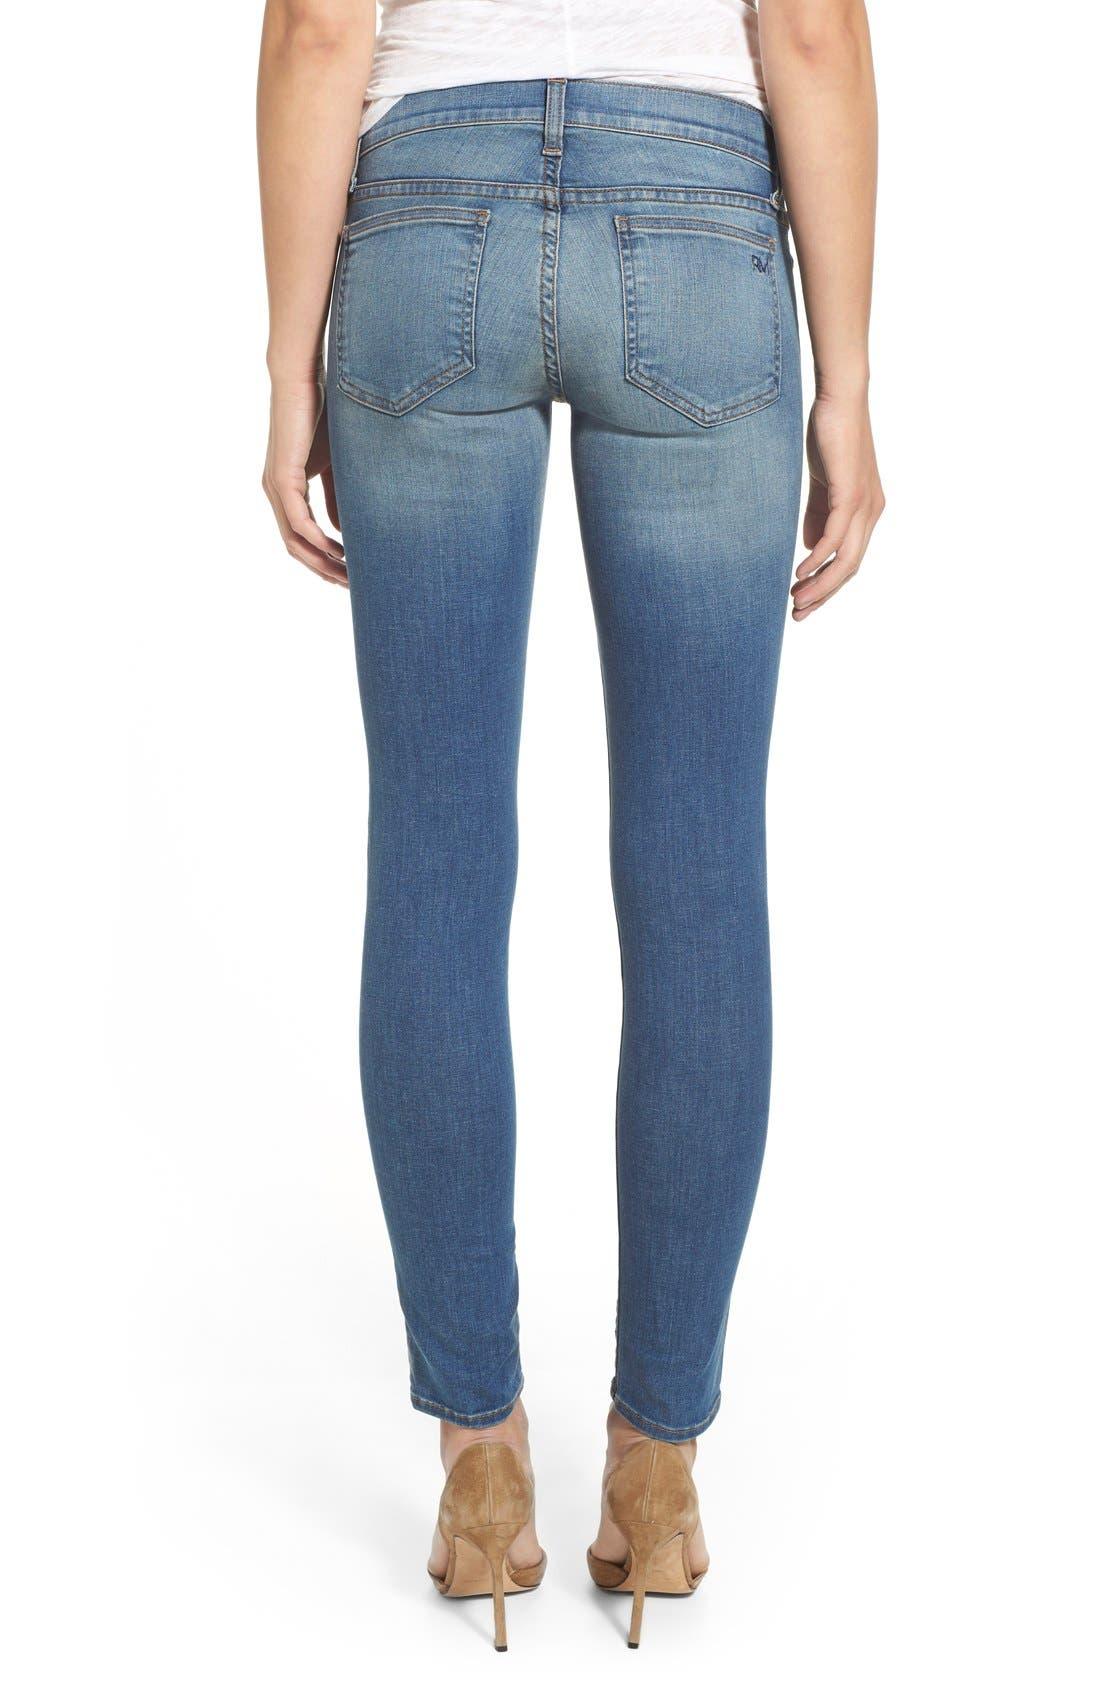 REBECCA MINKOFF, 'Jane' Skinny Jeans, Alternate thumbnail 2, color, 400